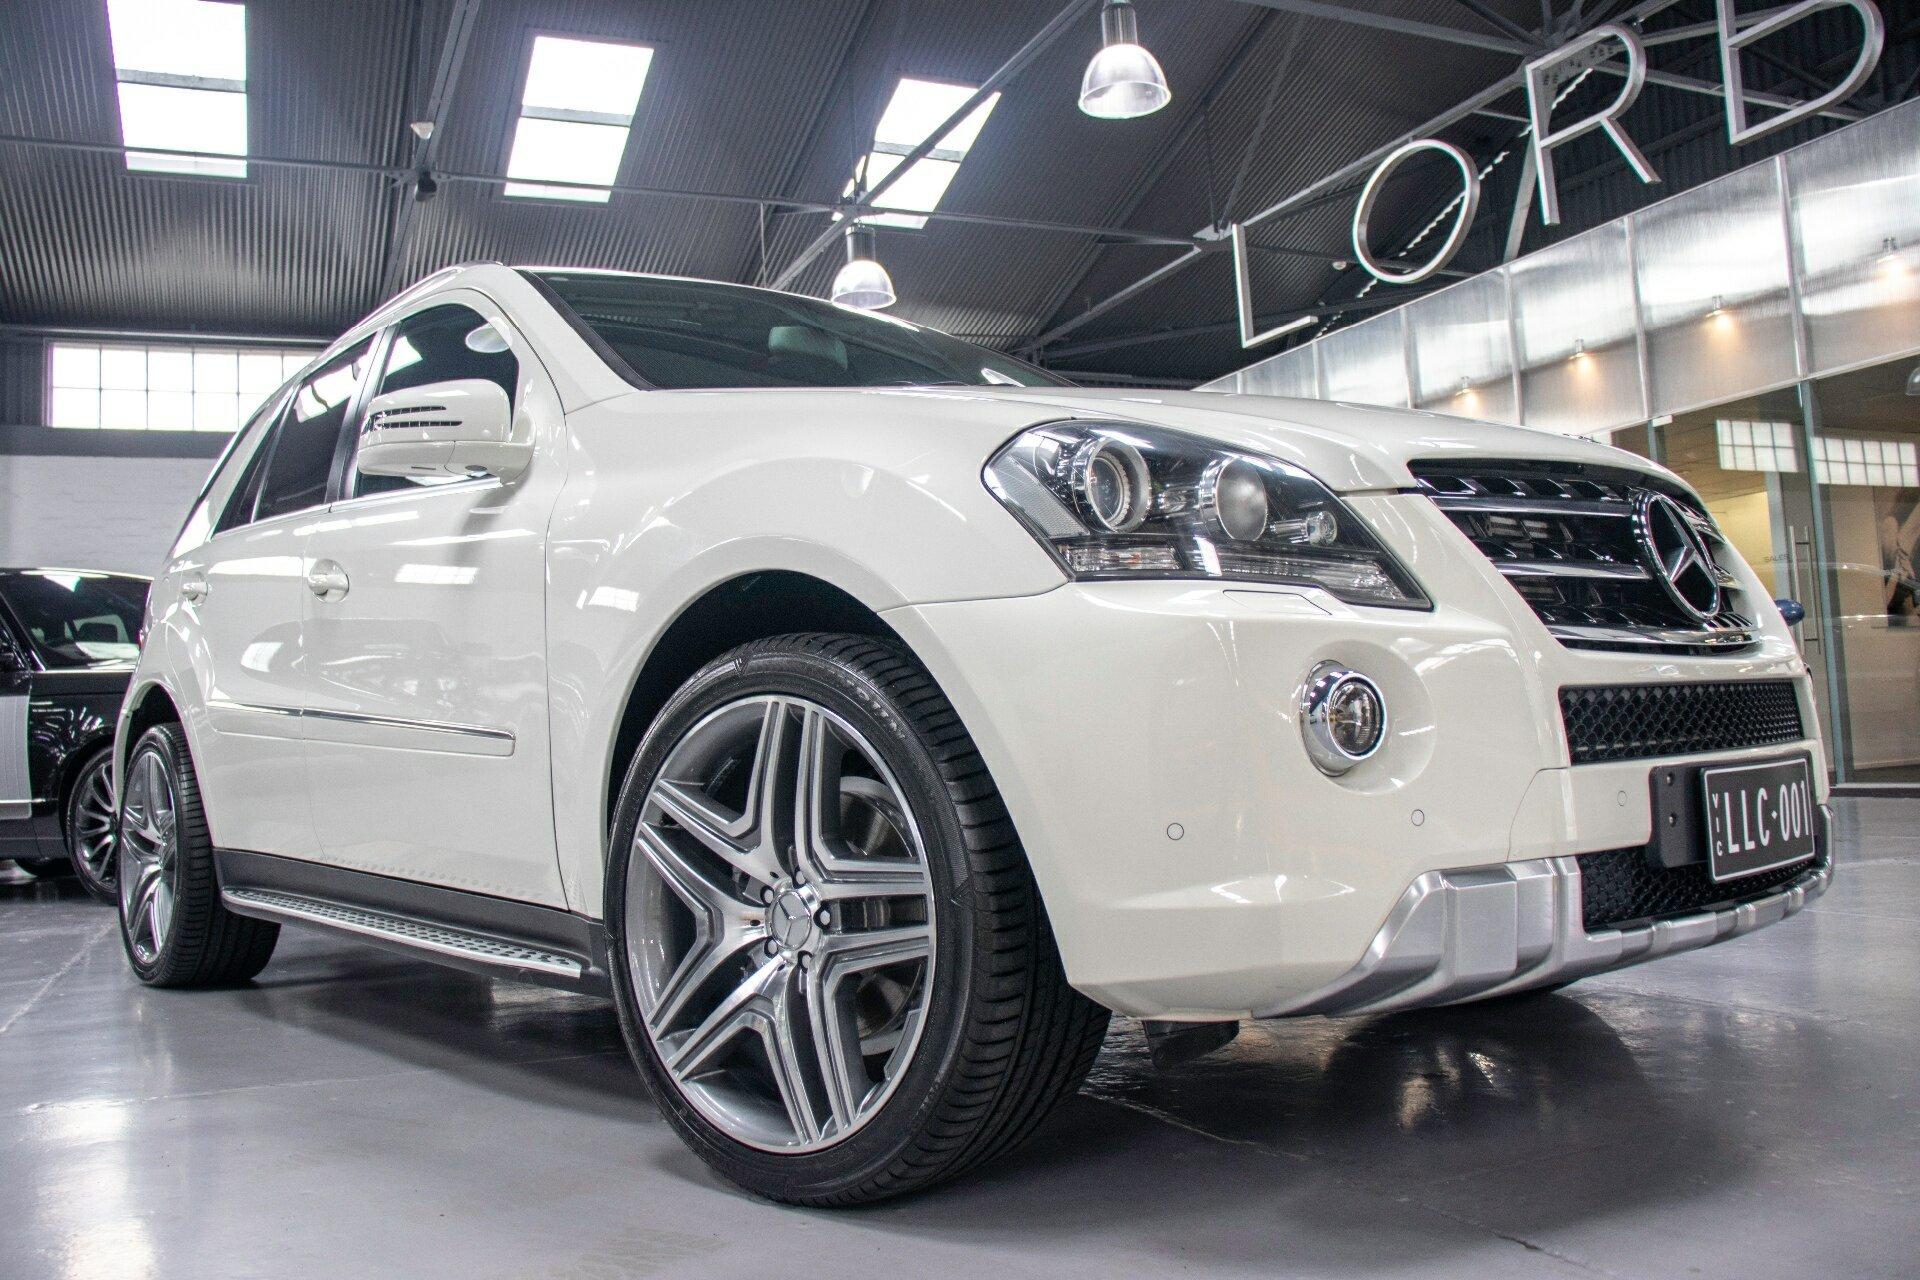 2012 Mercedes-benz Ml350 Cdi Amg Sports (4x4) 164